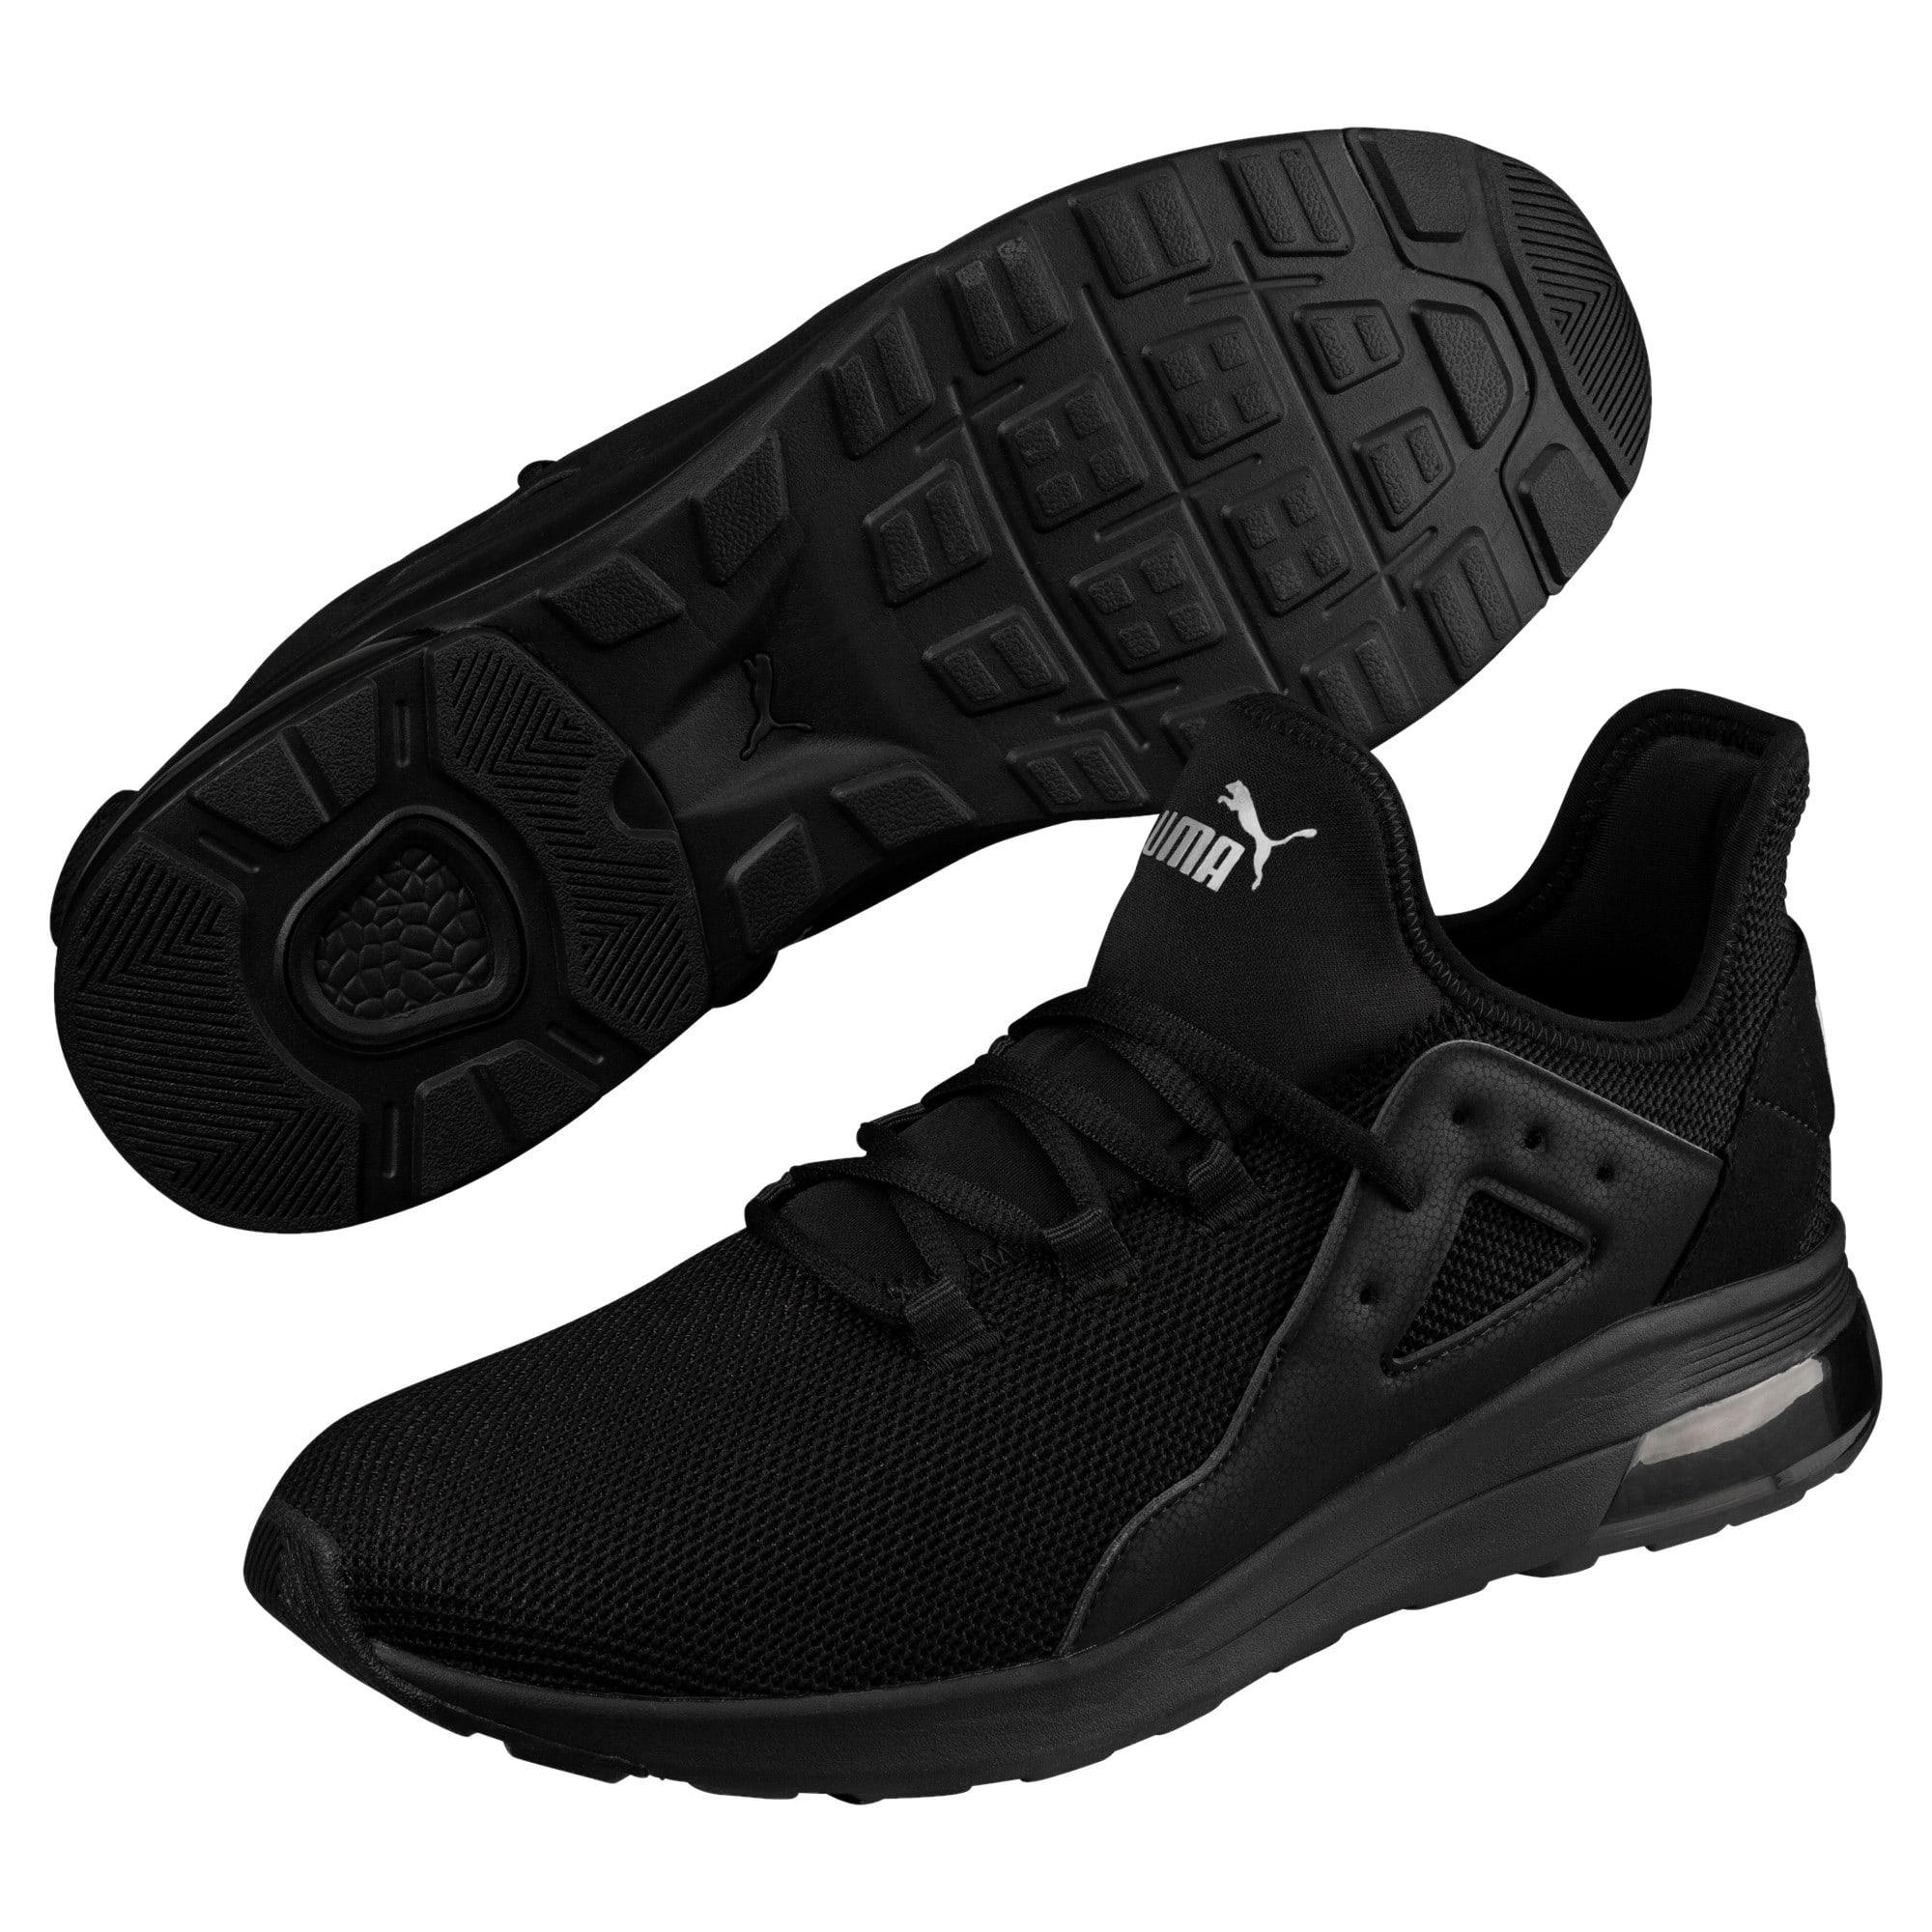 Thumbnail 2 of Electron Street Sneakers, Puma Black-Puma Black-Black, medium